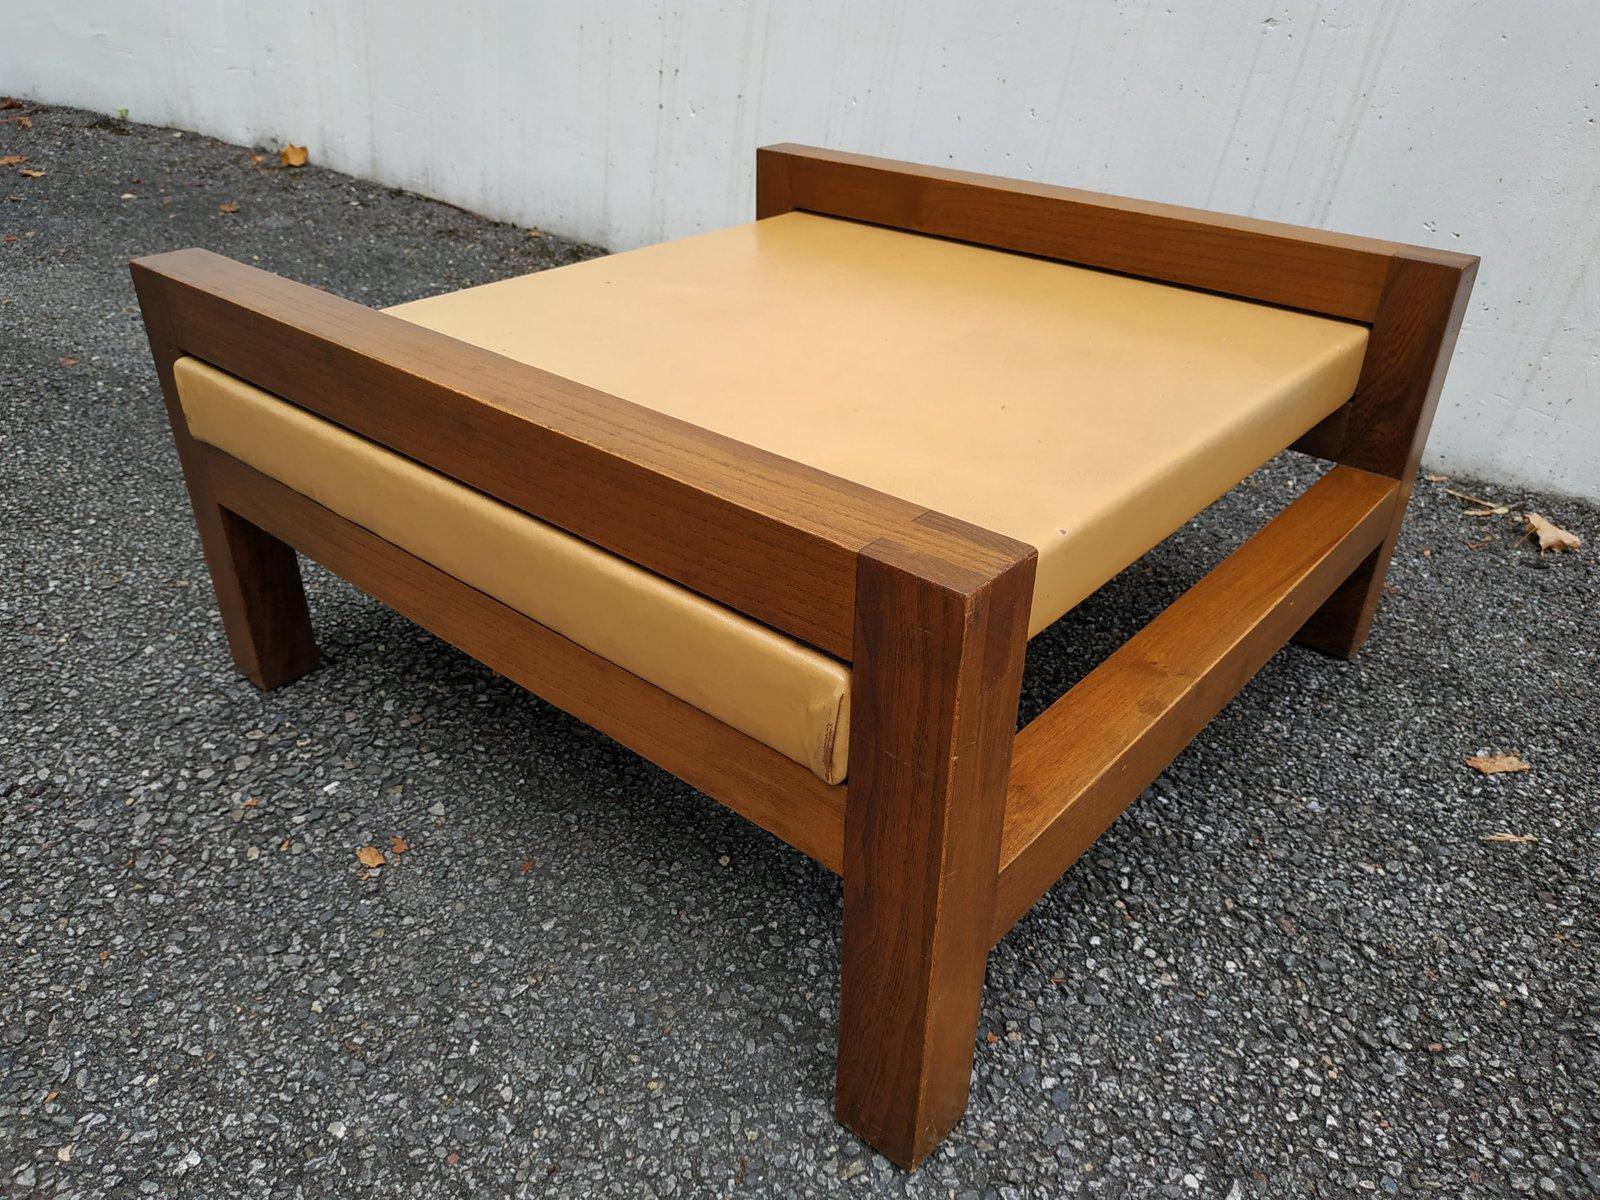 couchtisch aus holz kunstleder 1950er bei pamono kaufen. Black Bedroom Furniture Sets. Home Design Ideas